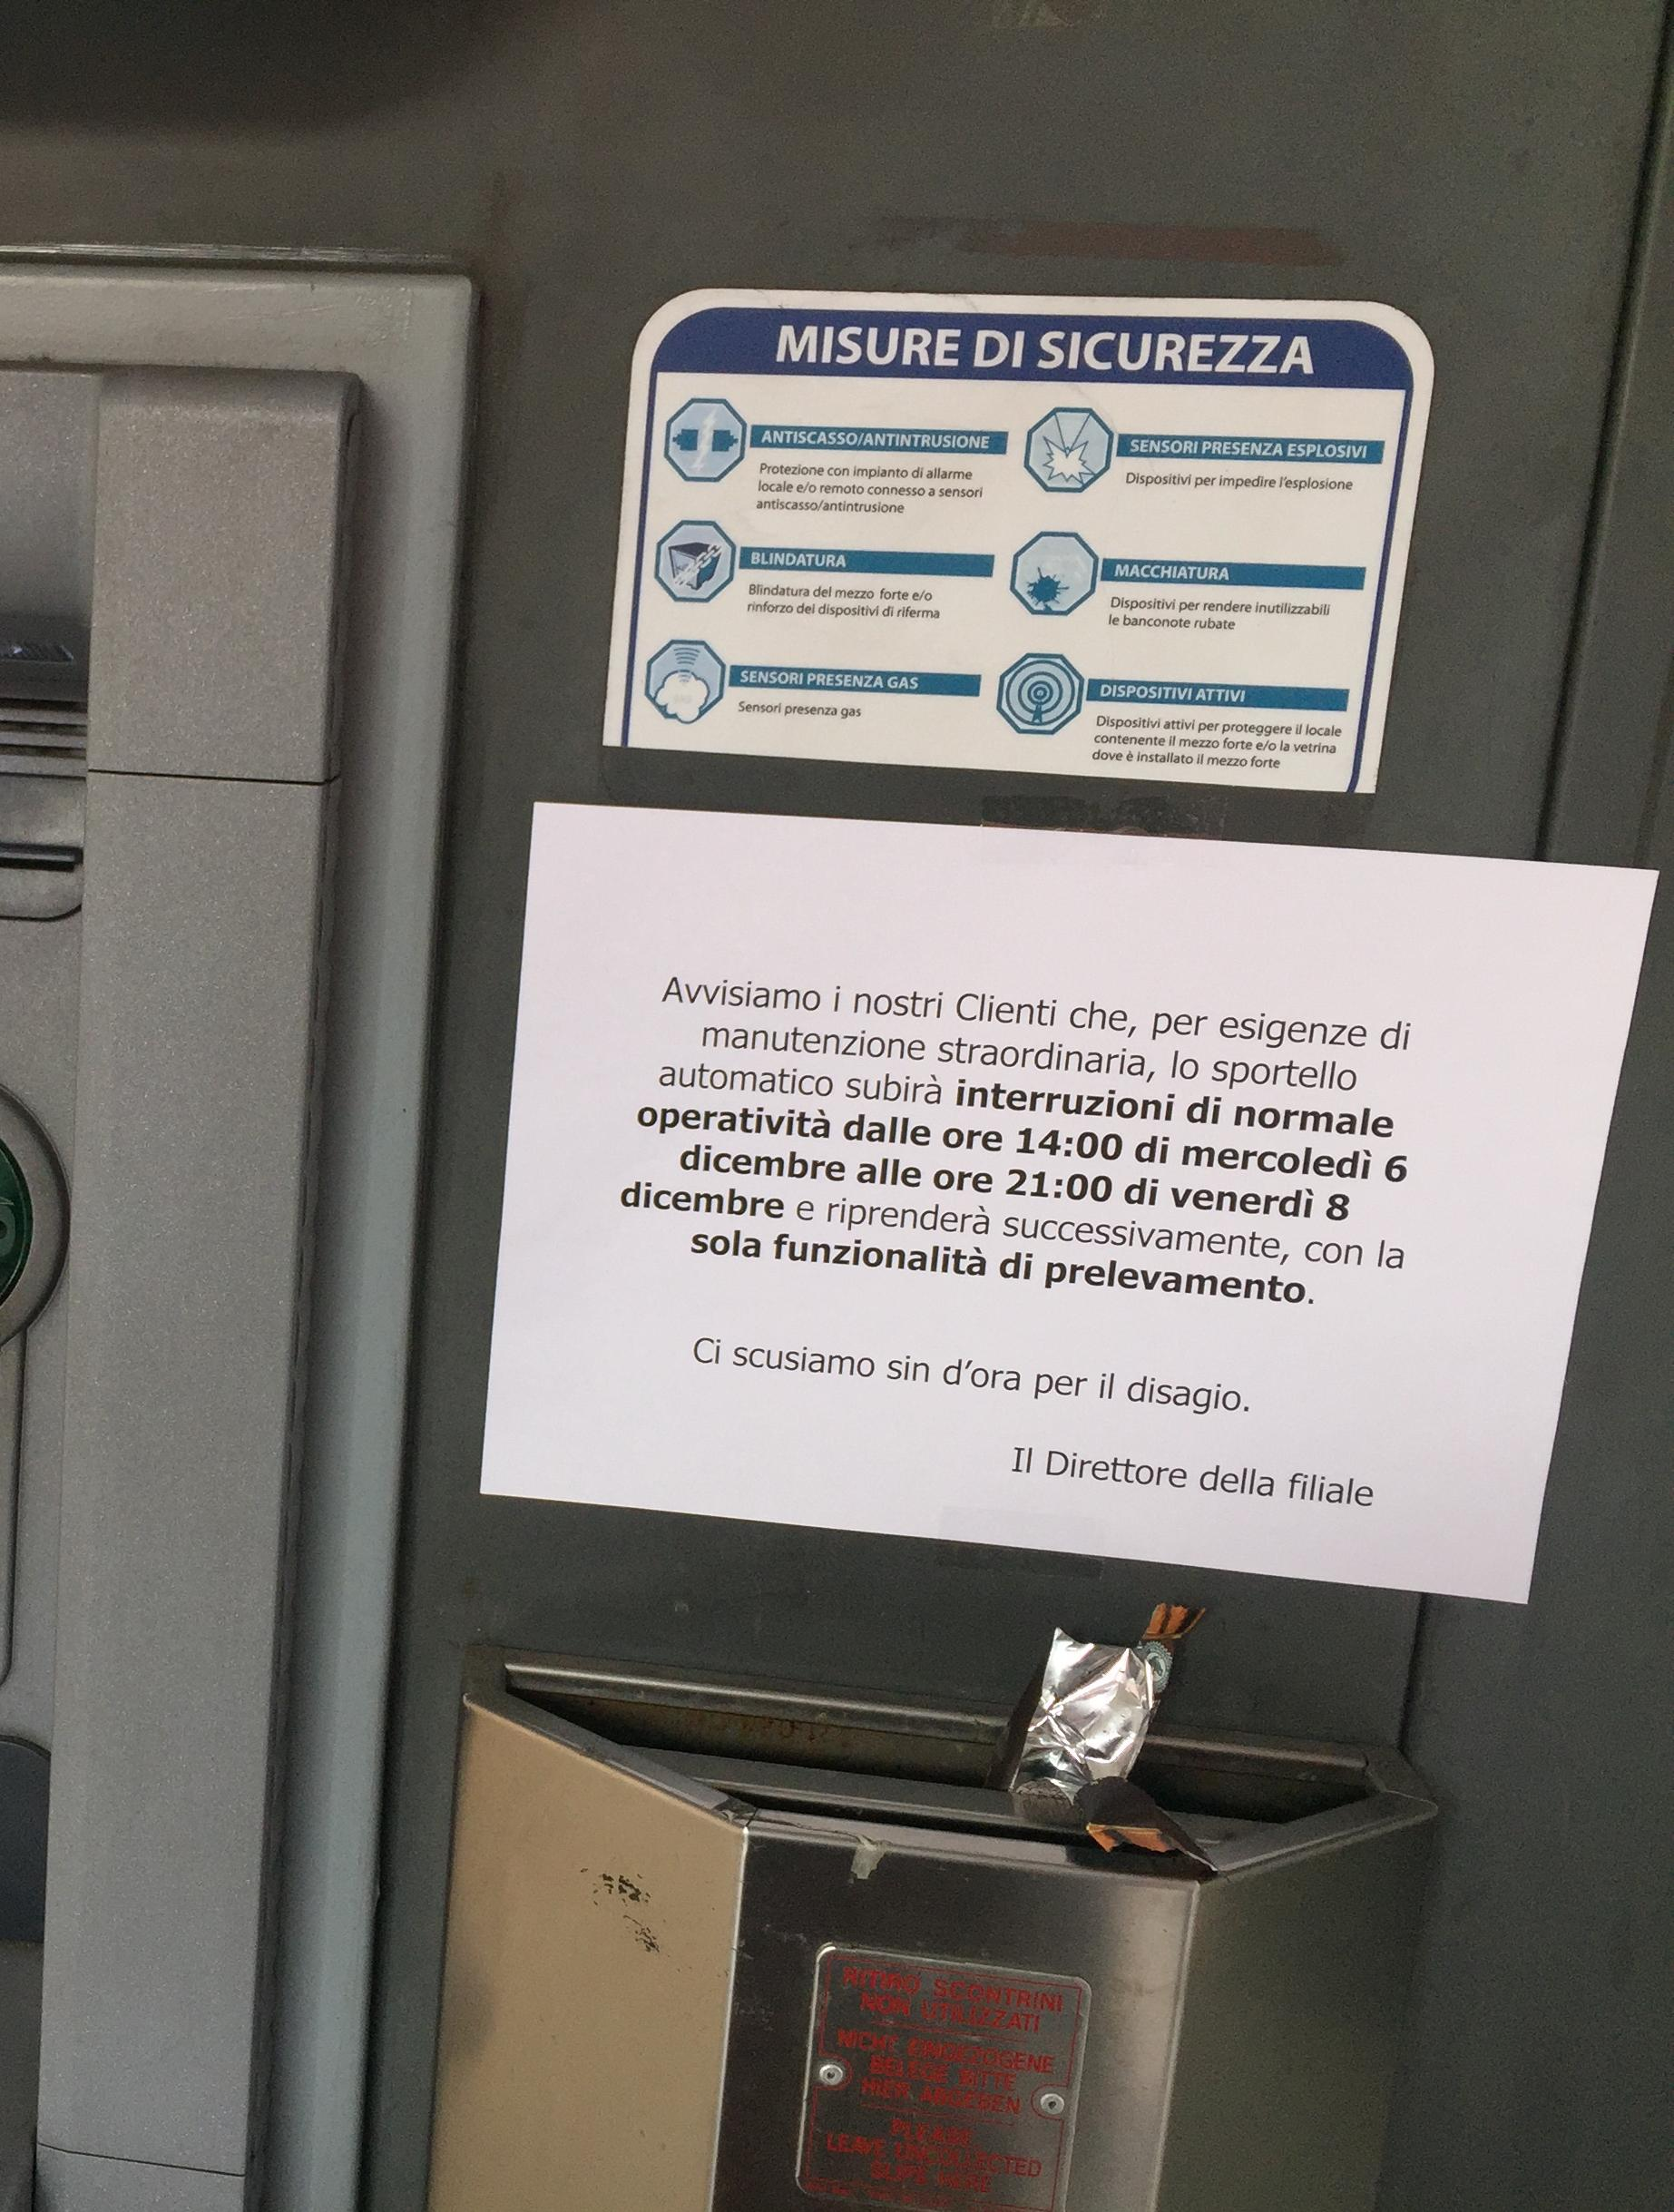 Banche venete via al trasloco in Intesa Sanpaolo Ban at a singhiozzo fino a venerd¬ CorrieredelVeneto